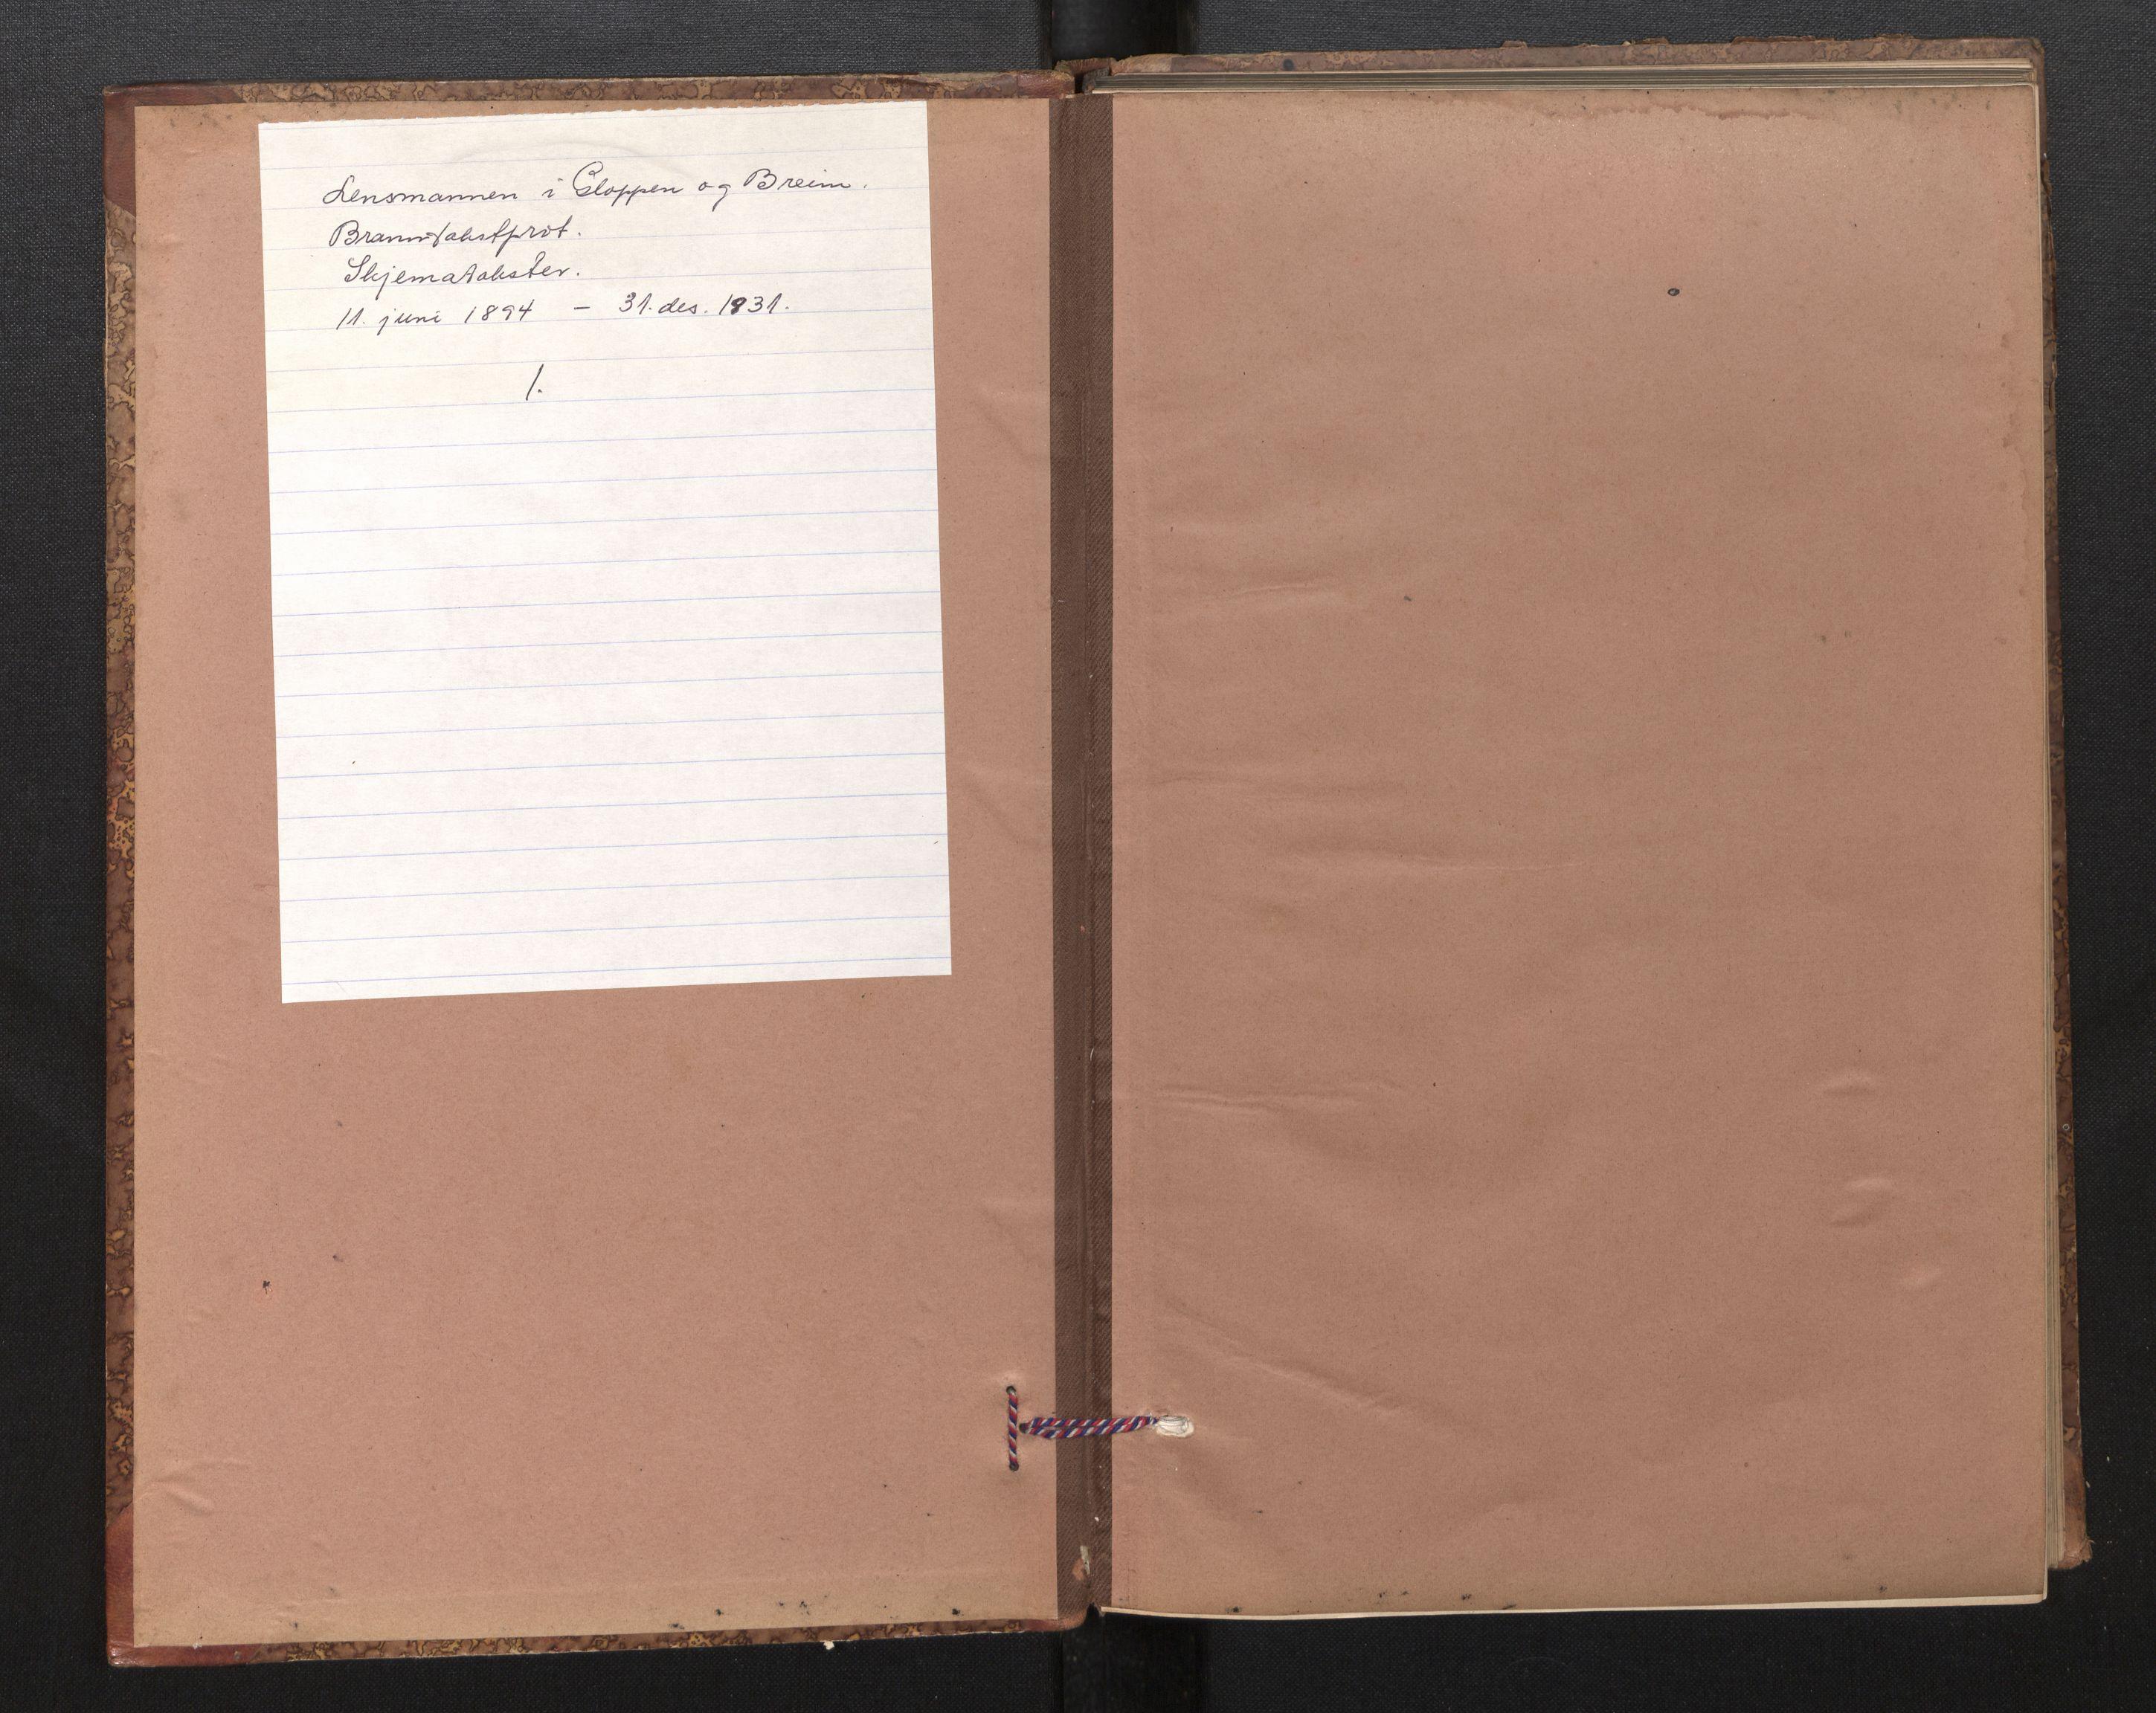 SAB, Lensmannen i Gloppen og Breim, 0012/L0003: Branntakstprotokoll, skjematakst, 1894-1931